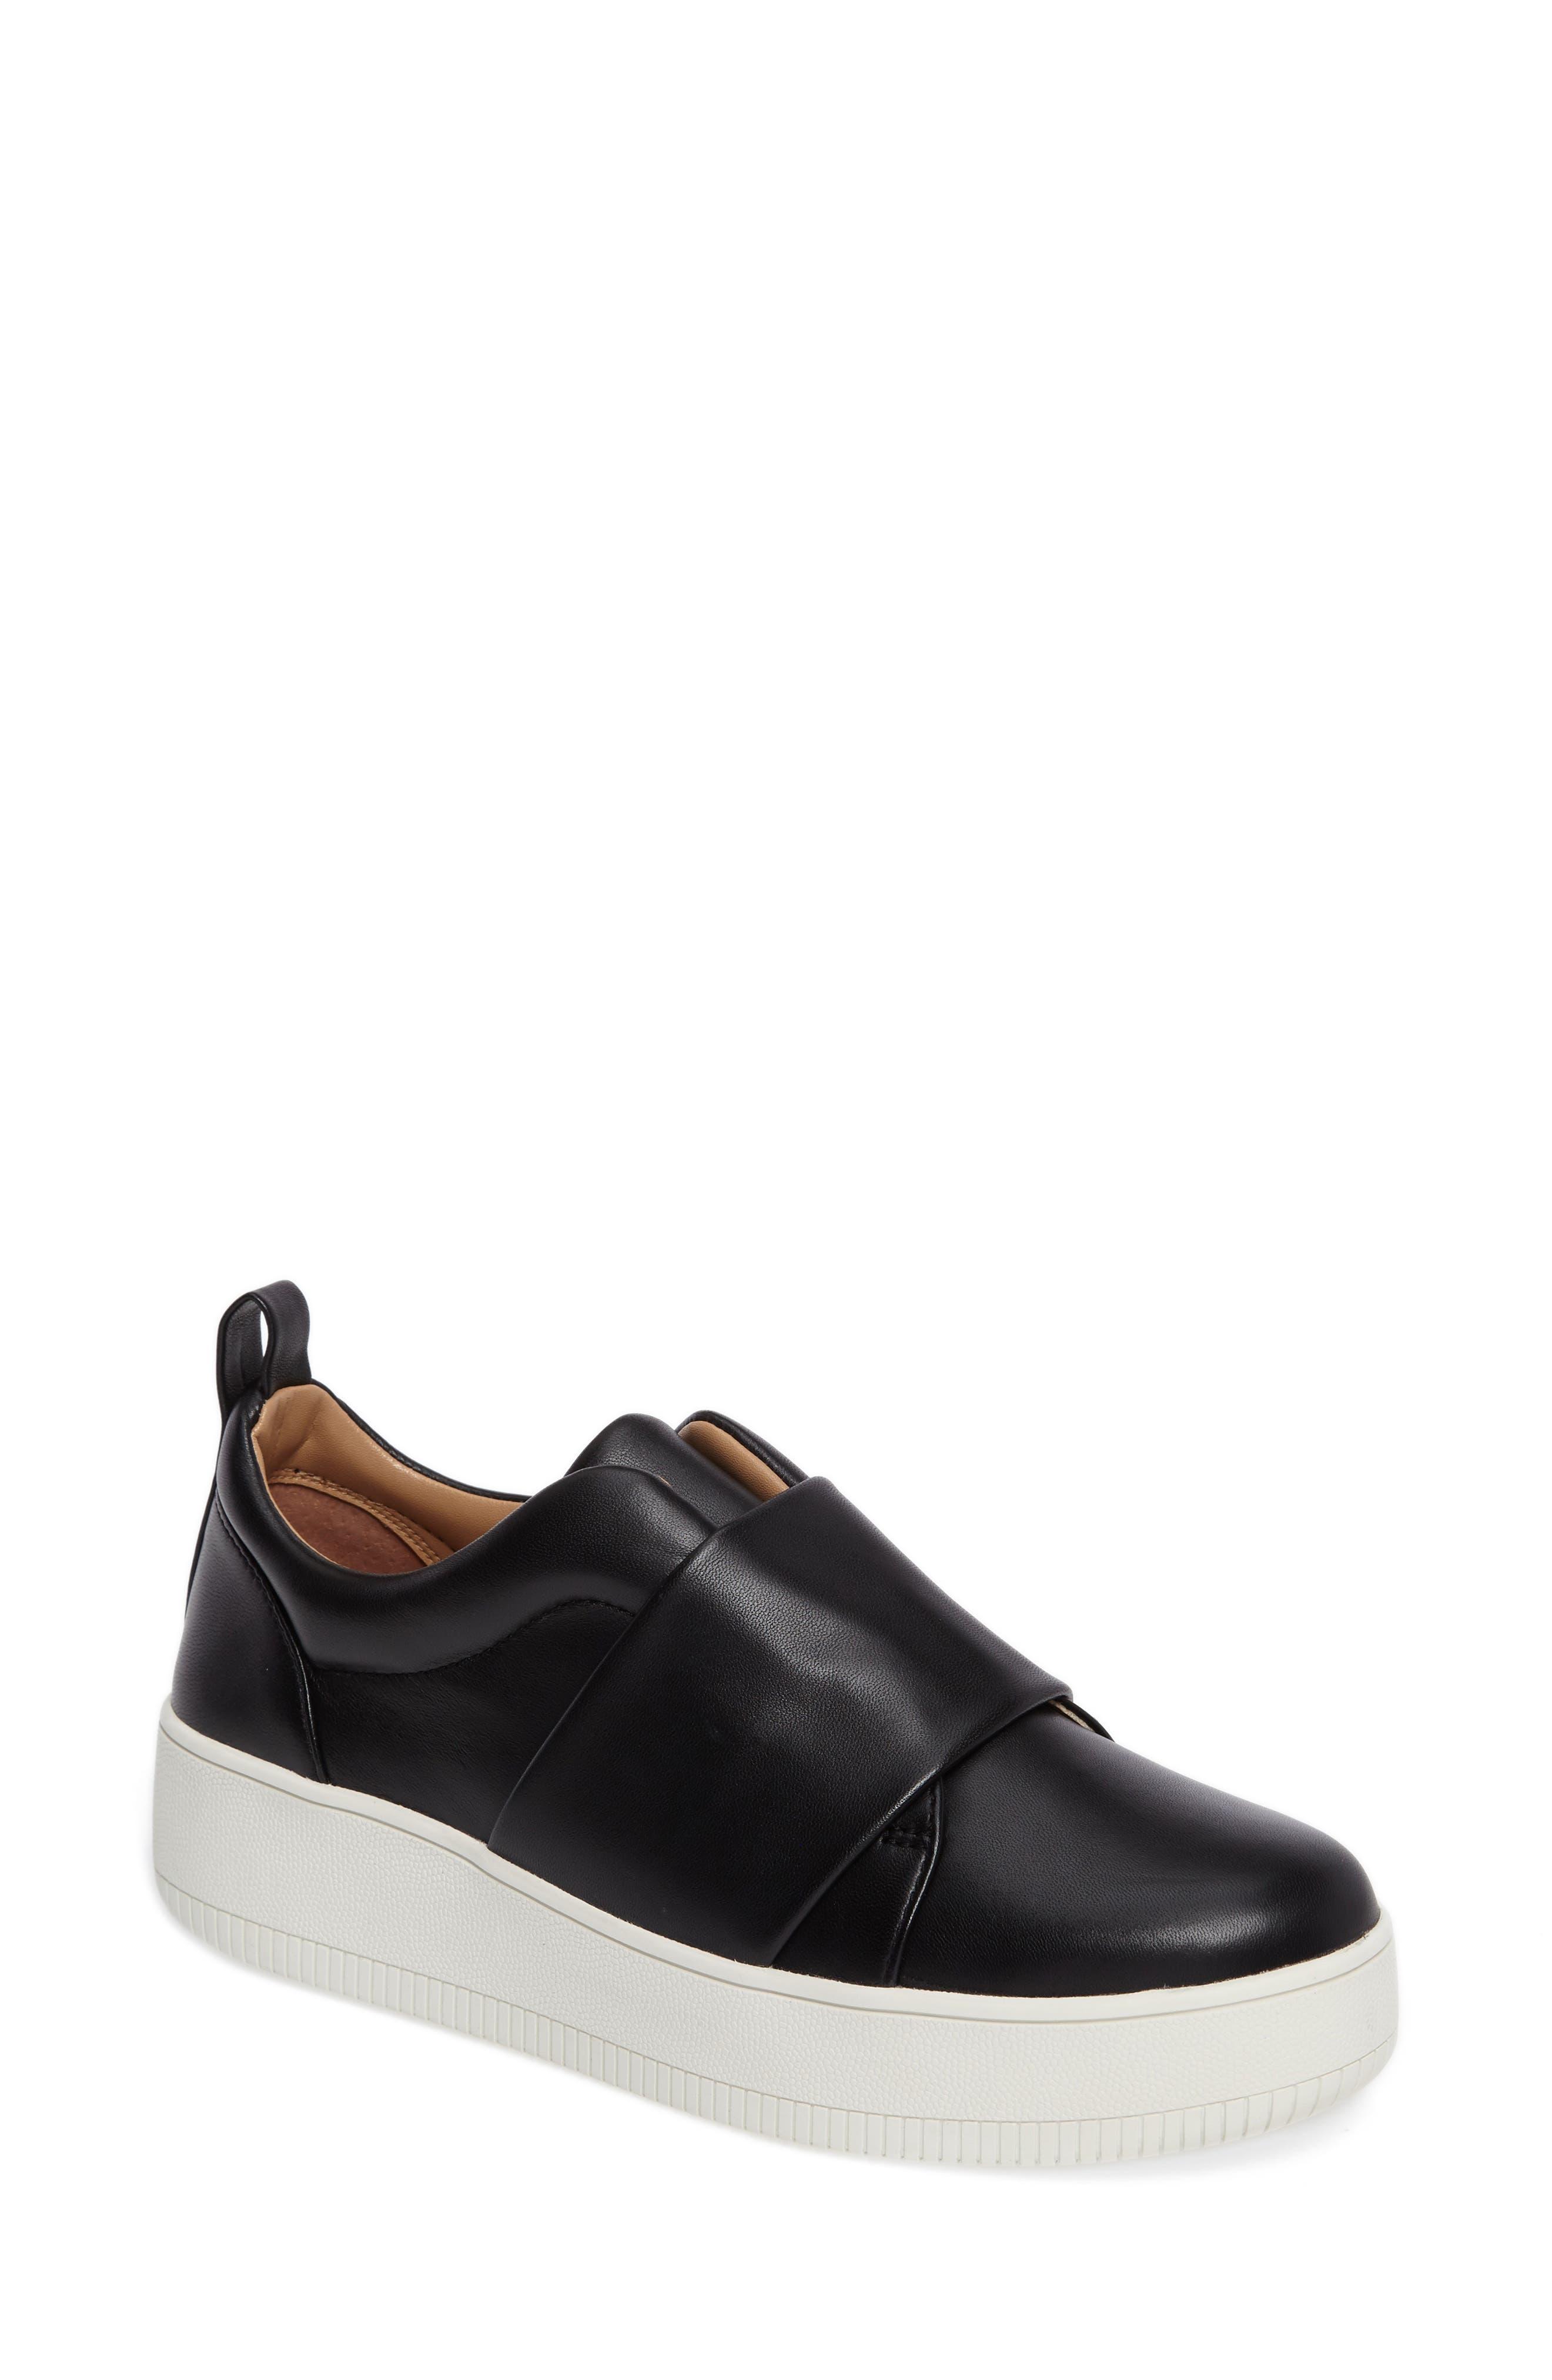 Suzie Platform Sneaker,                         Main,                         color, 001